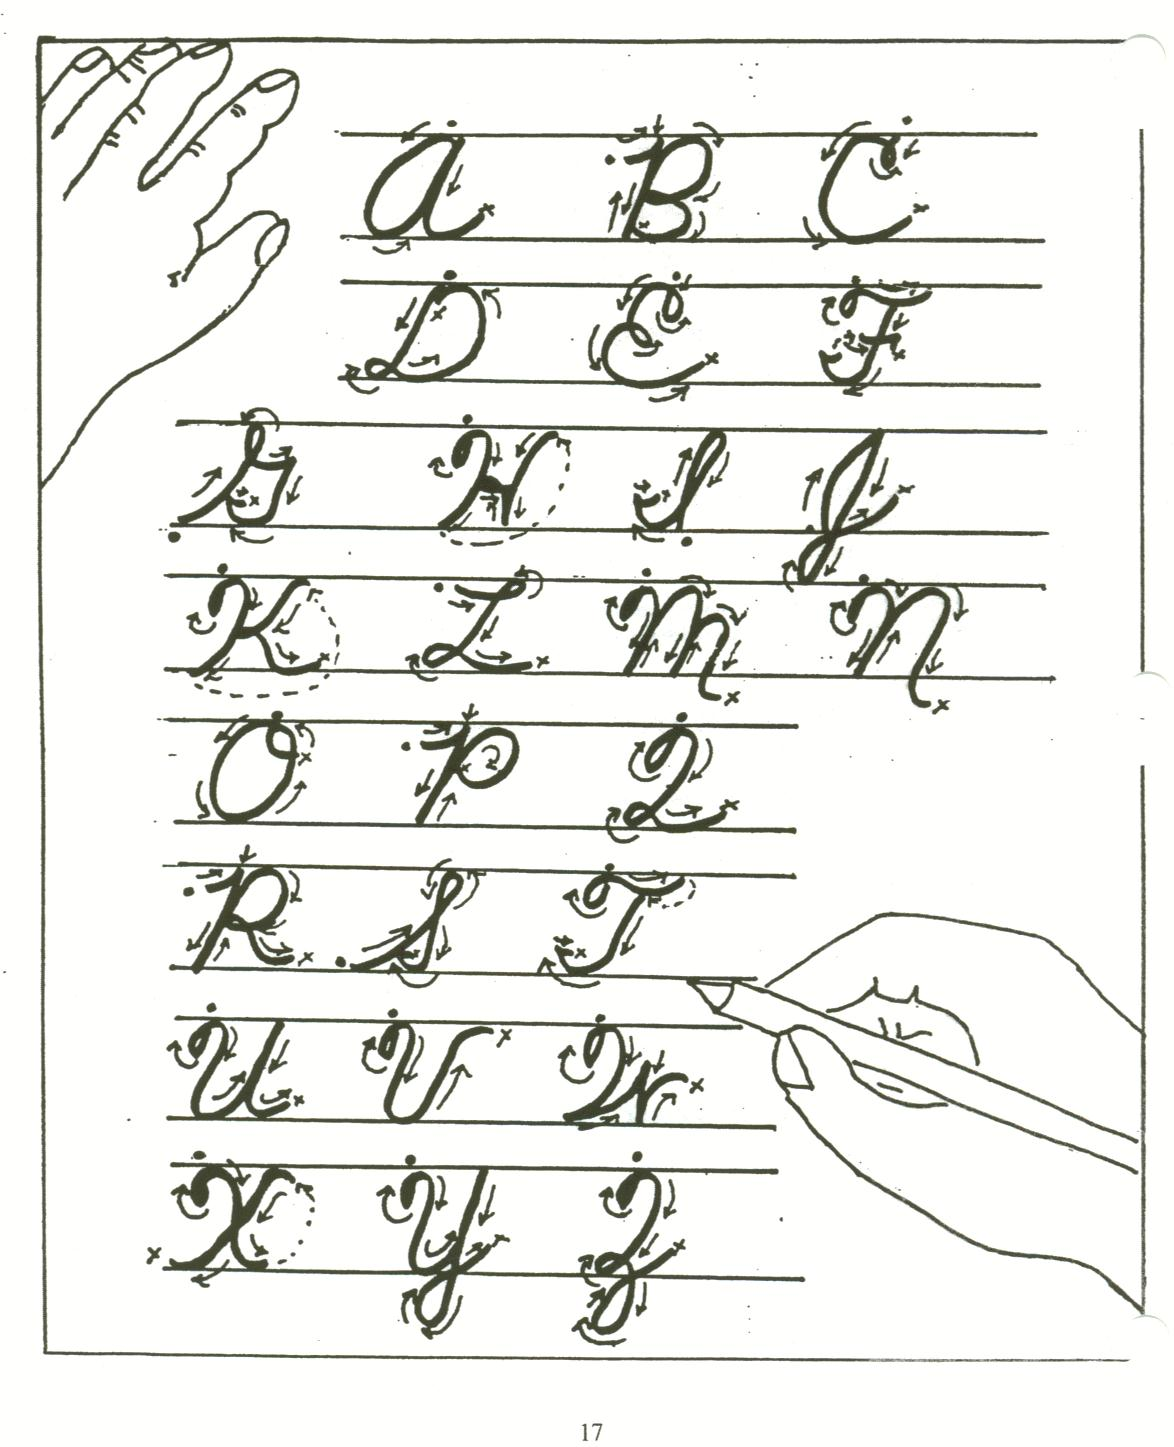 Worksheet Cursive Paper how long can paper and cursive last ross jos blog handwriting